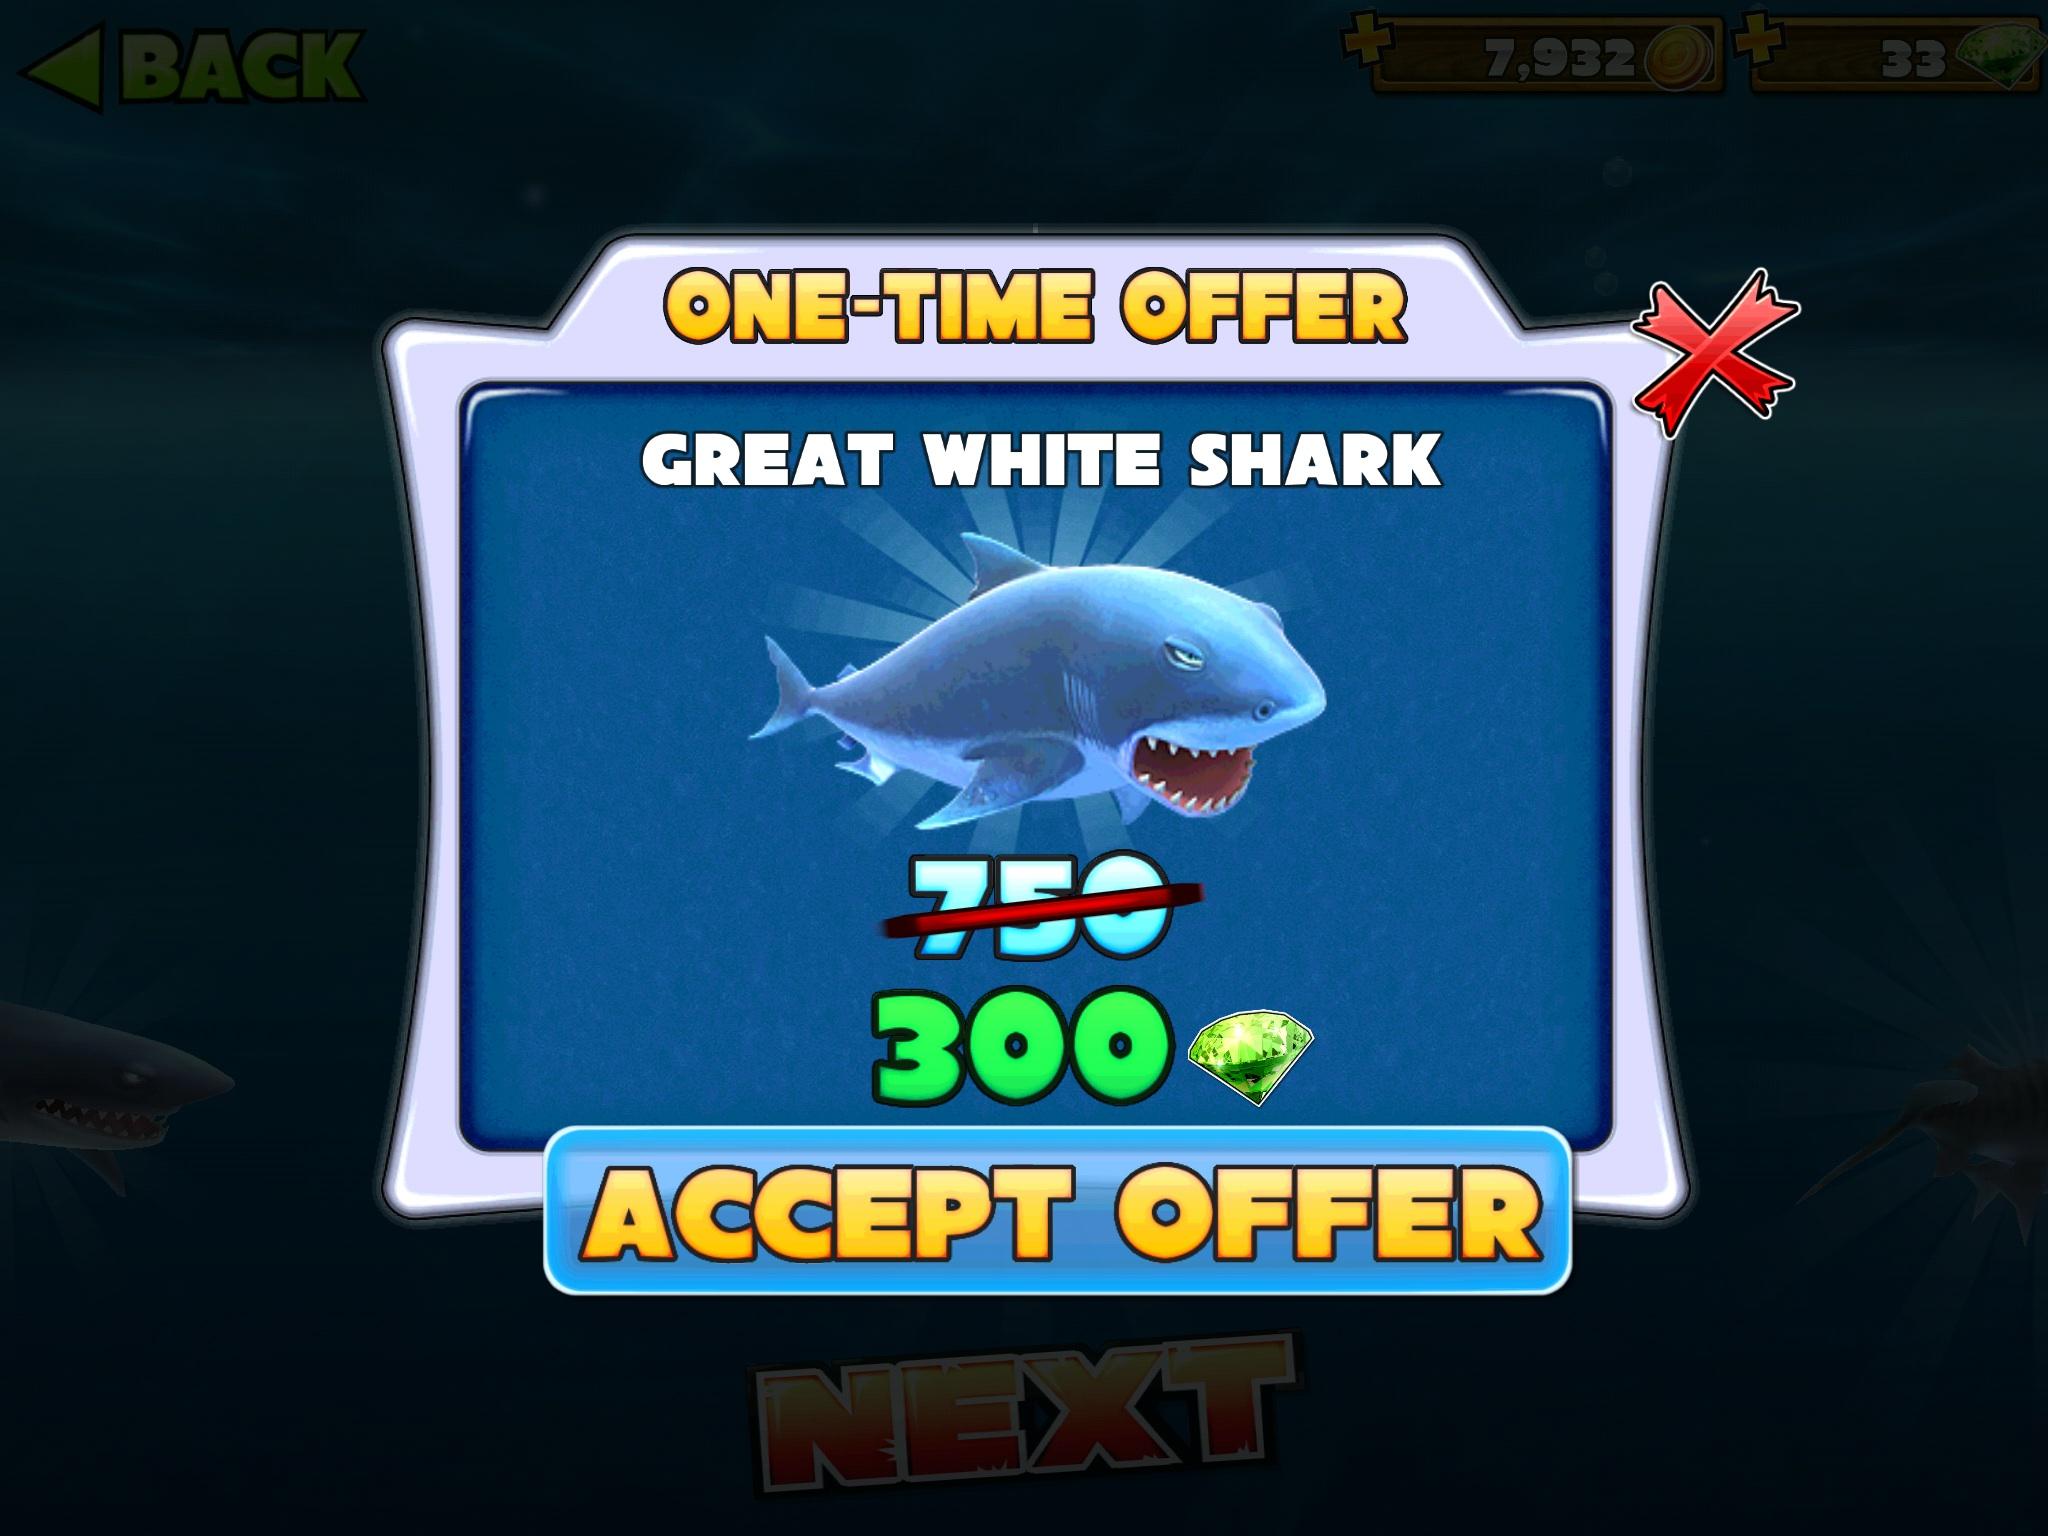 Great White Shark Discount.jpg